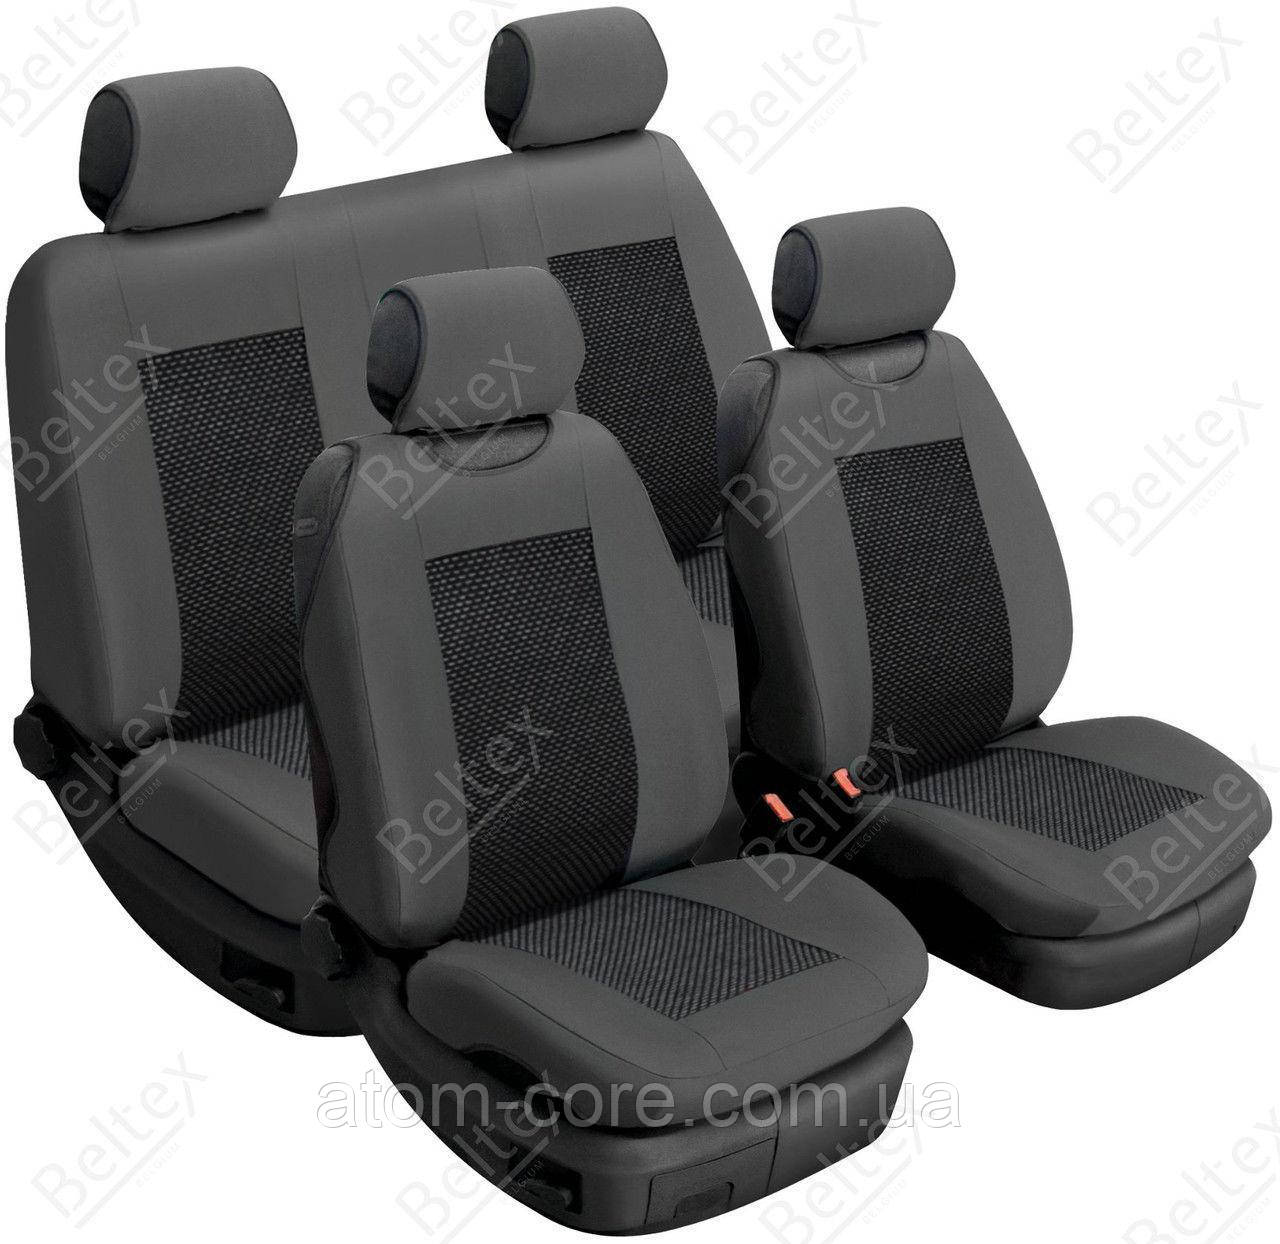 Майки/чехлы на сиденья Хонда СРВ 2 (Honda CR-V II)